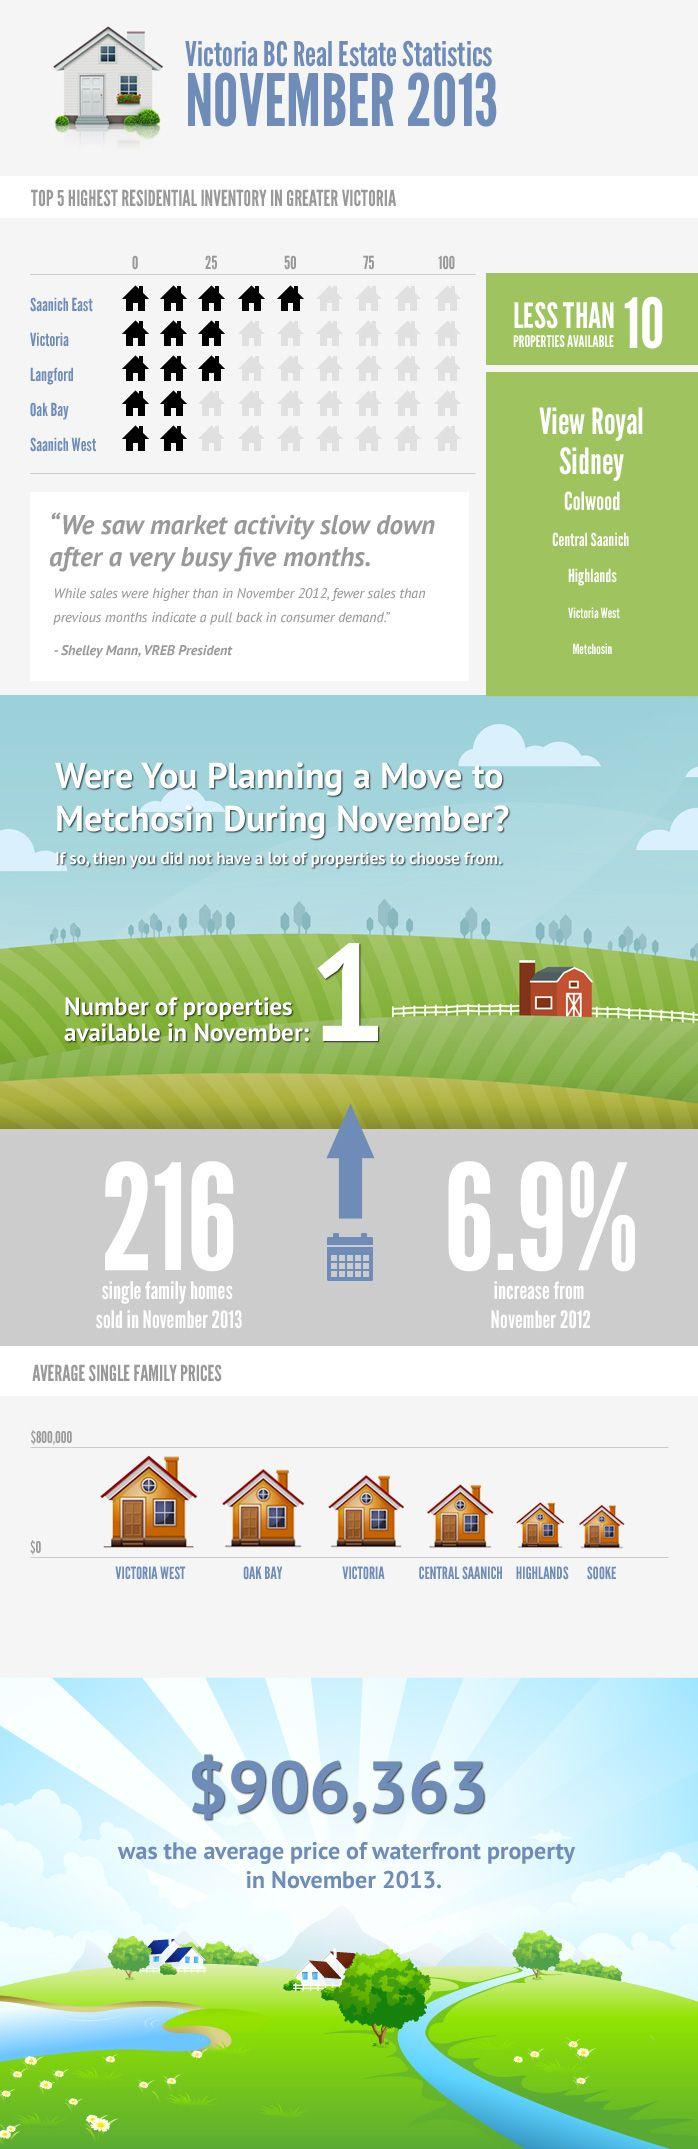 Victoria BC Real Estate Stats - November 2013